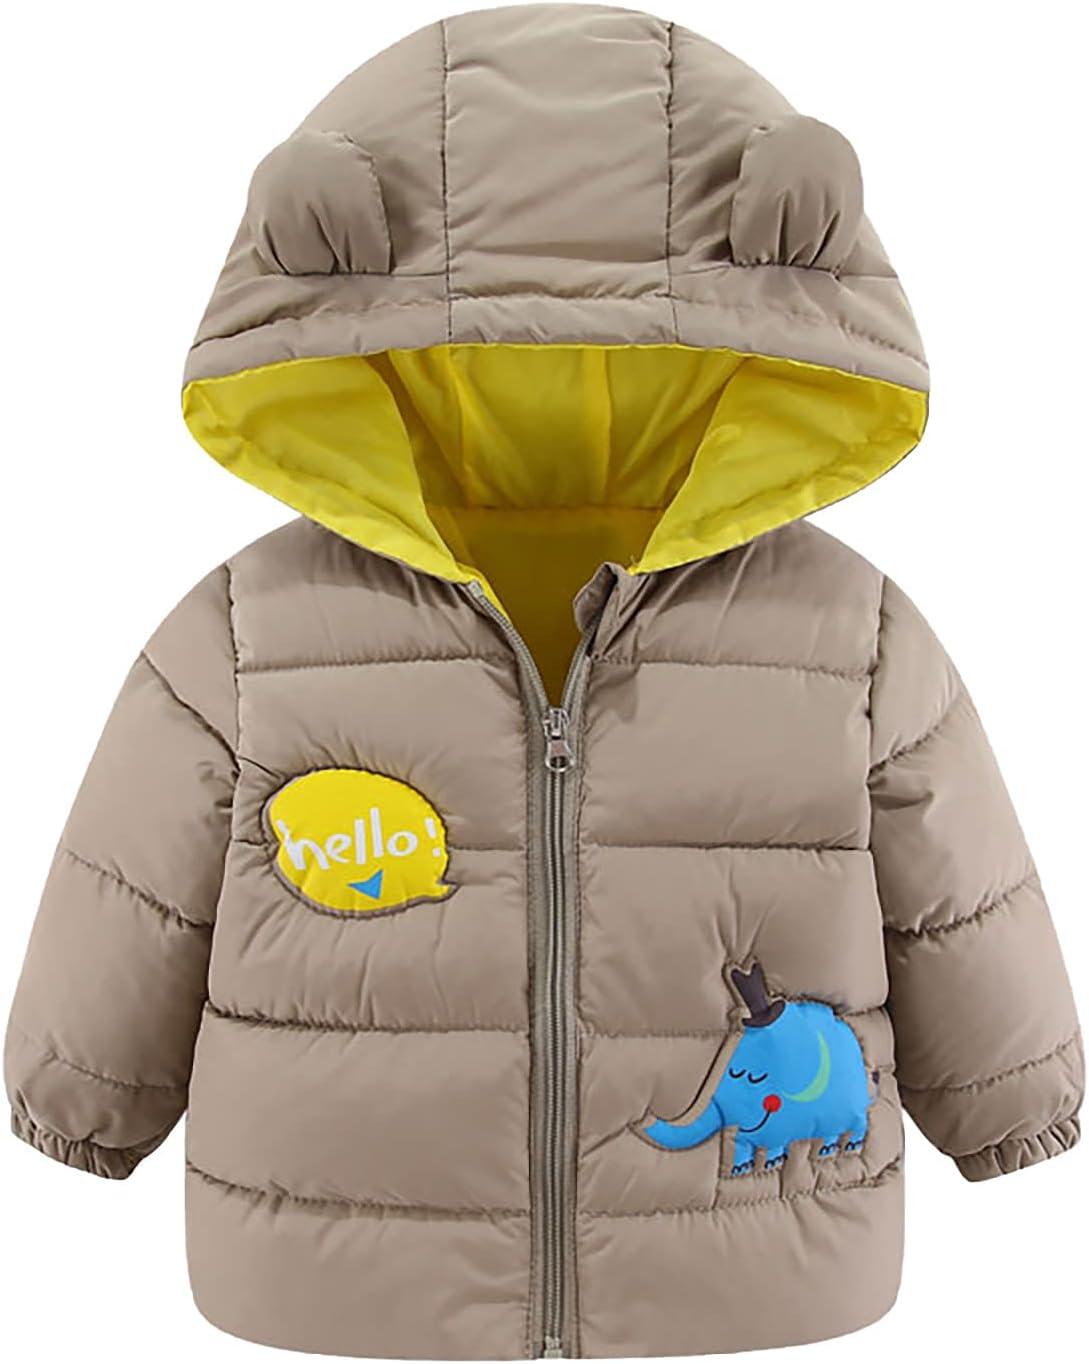 Children's Fashion Jacket-Winter wholesale Baby Award Girls Boys Cute Ea Cartoon